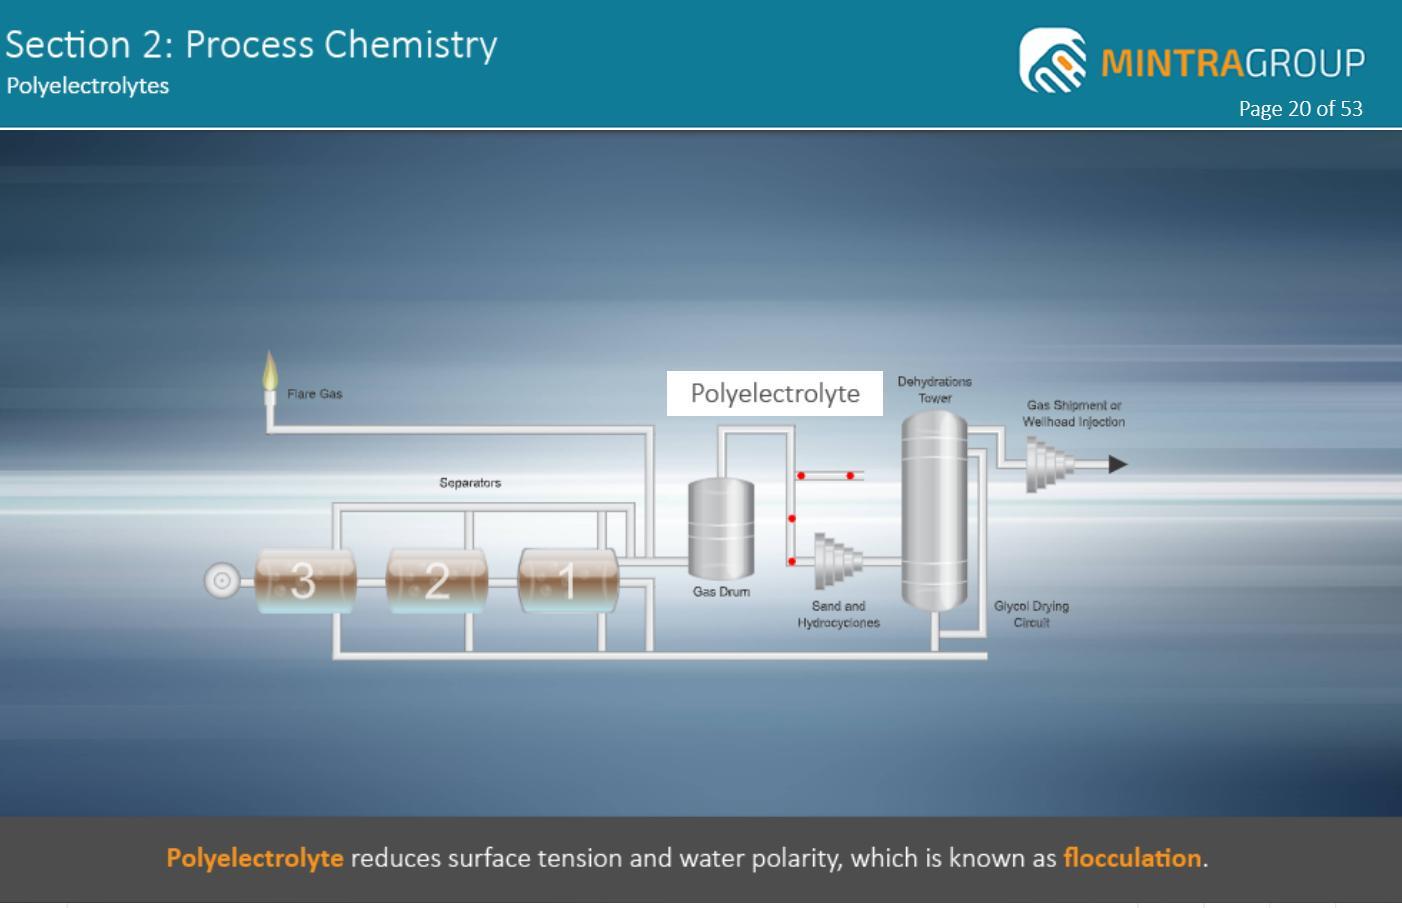 Process Chemistry Training 4